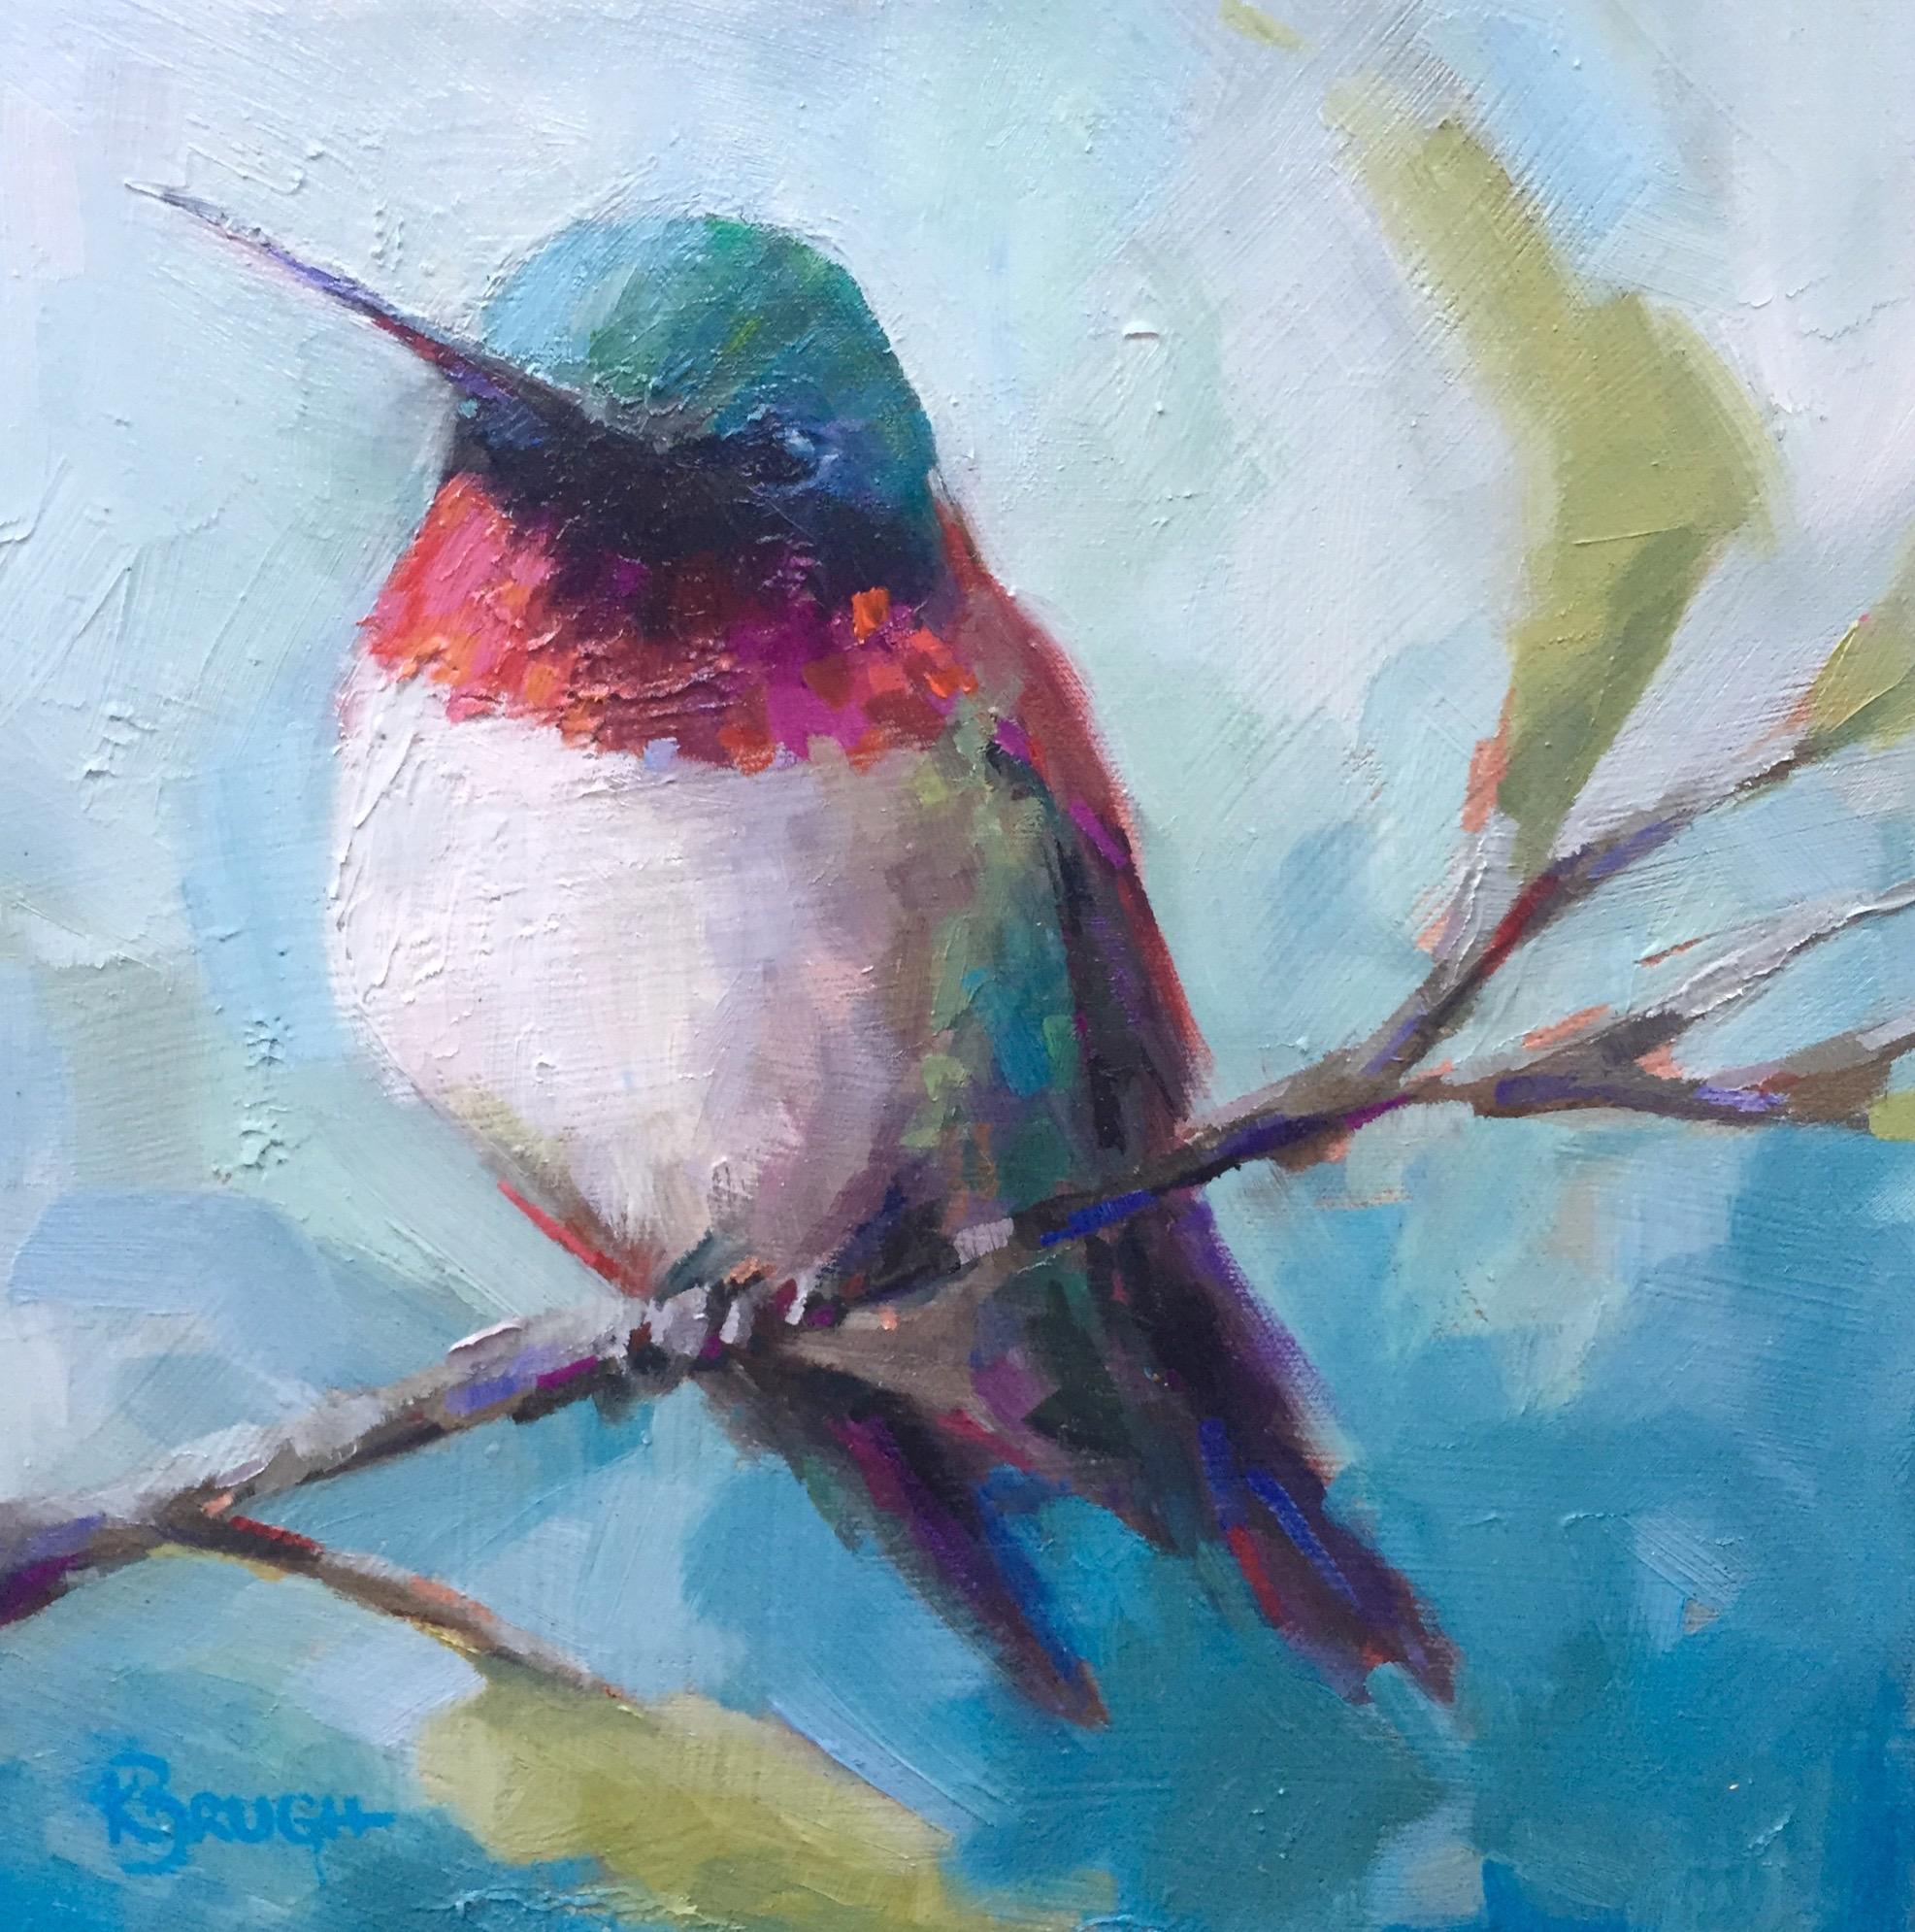 Ruby Red by Kelley Brugh_12x12, Oil on canvas.jpg